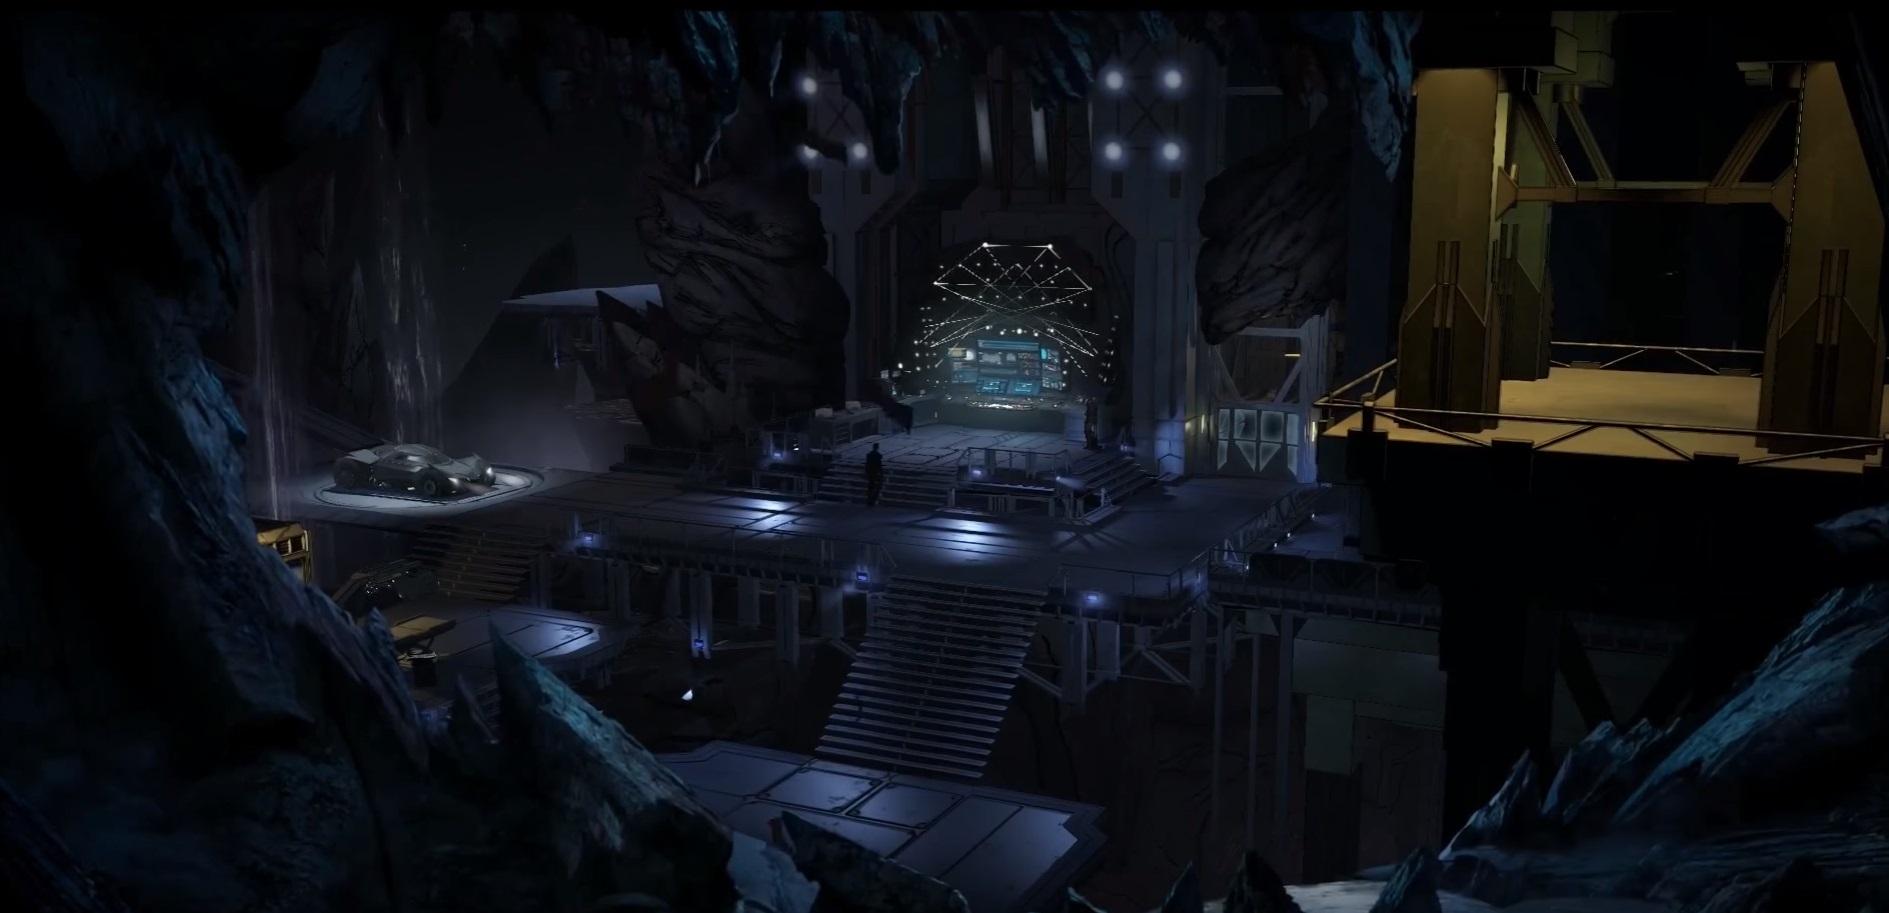 Batcave | Batman: The Telltale Series Wikia | FANDOM powered by Wikia